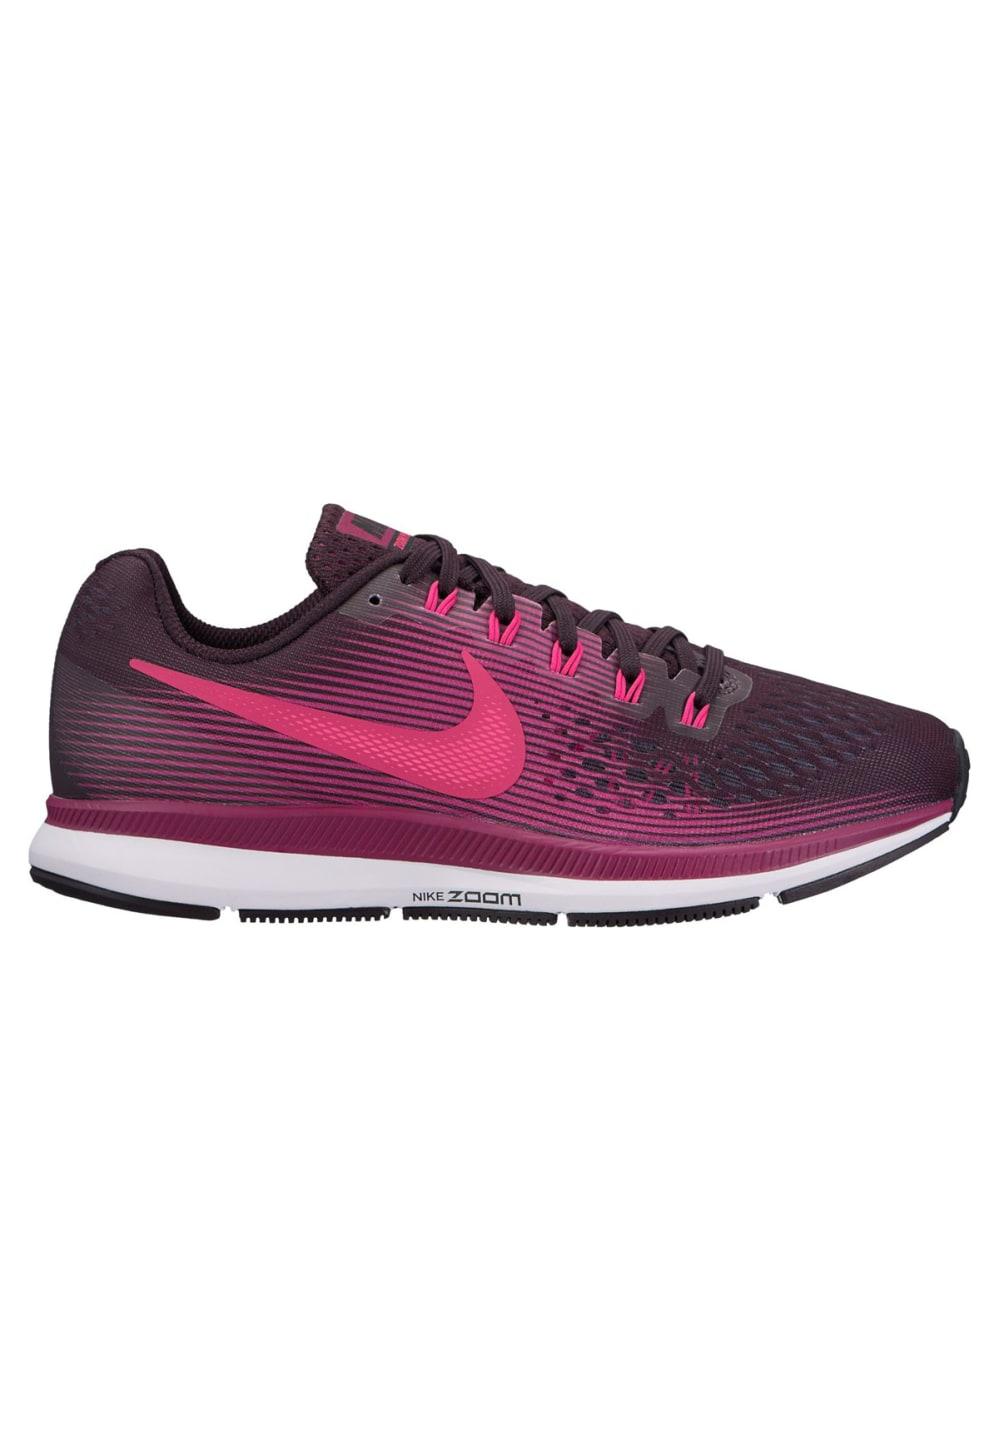 super popular ce755 59401 Nike Air Femme pour Chaussures Pegasus Zoom Violet 34 running rrqzCwd